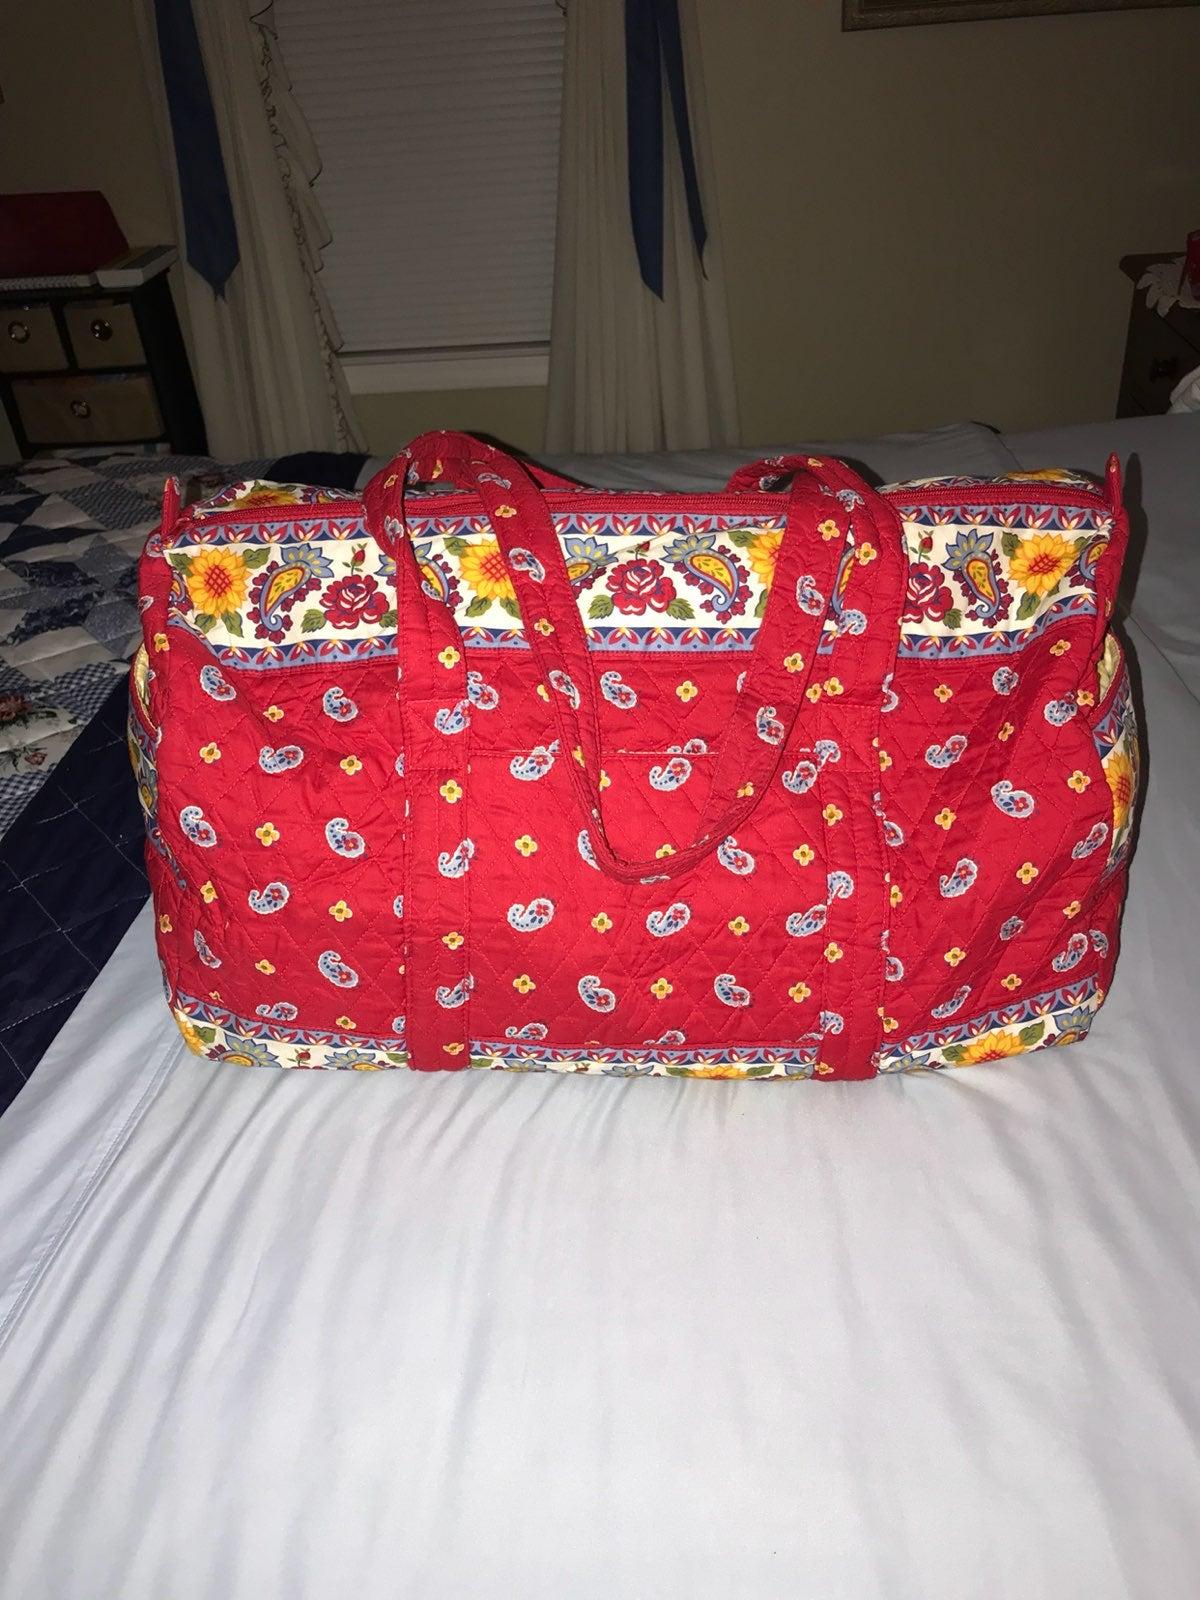 Red Paisley Quilted Weekender Bag